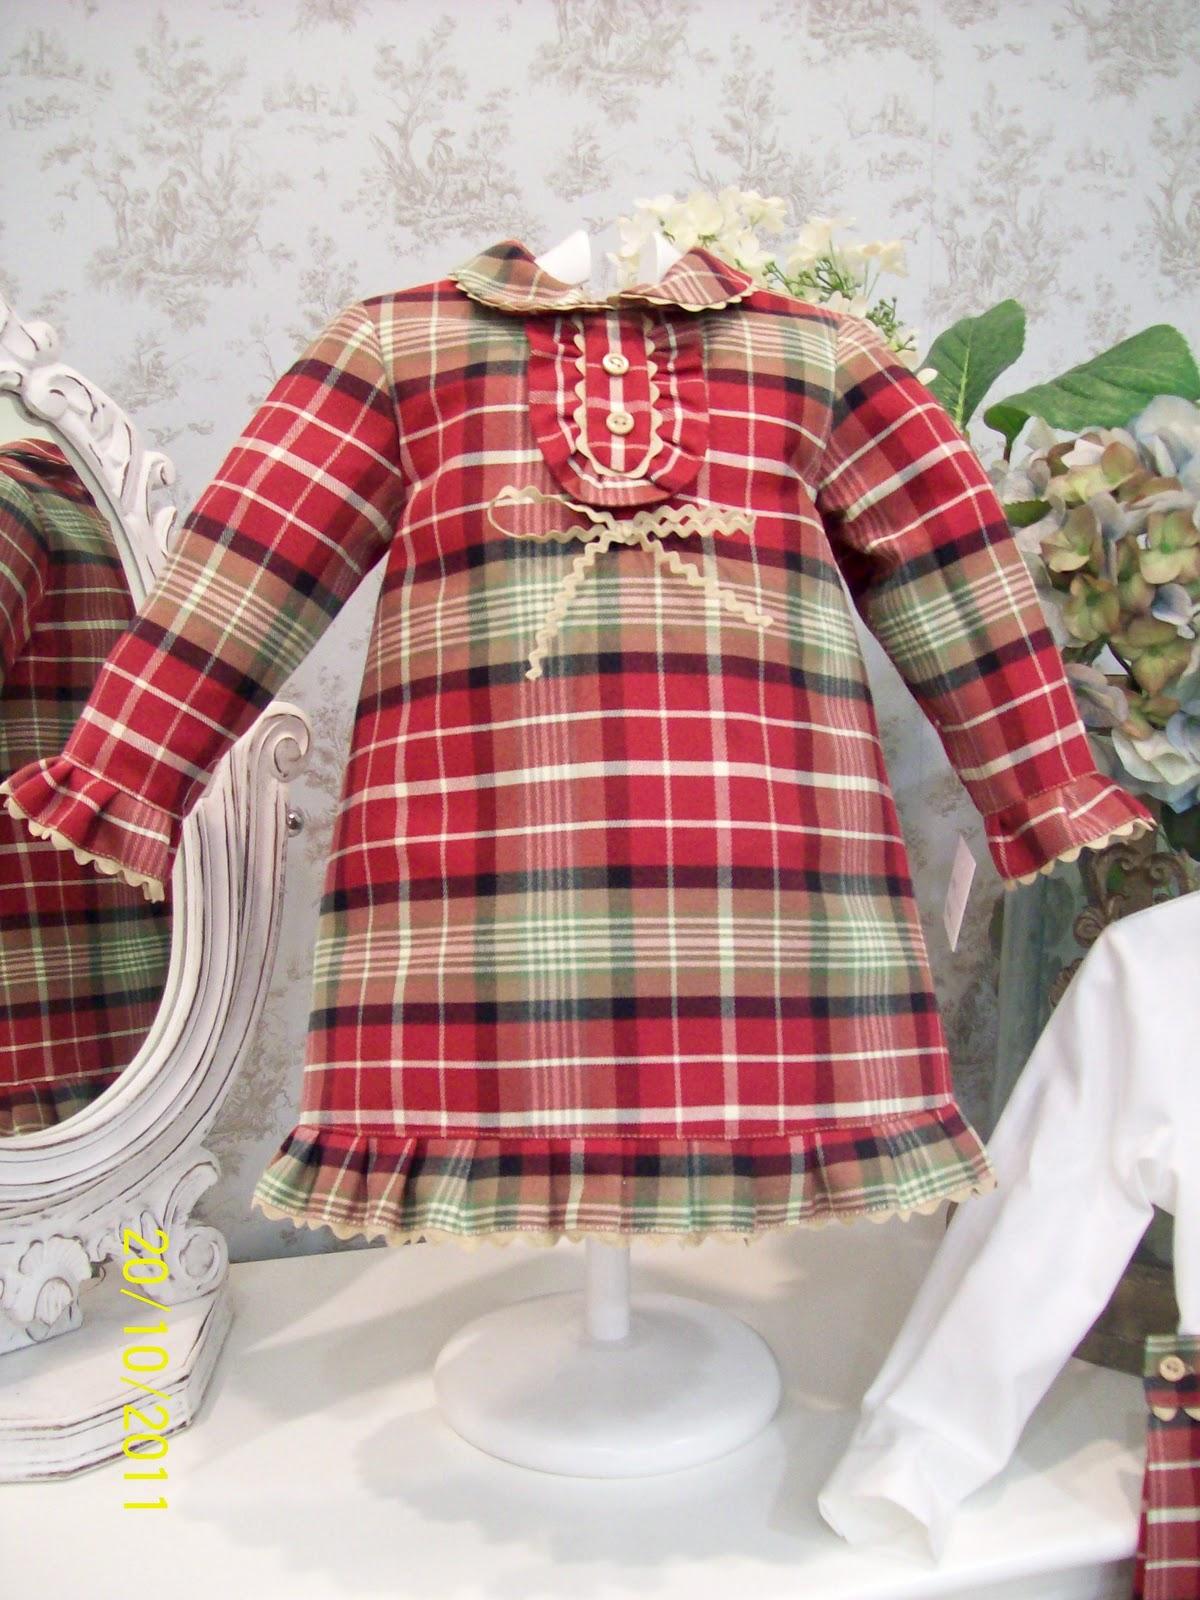 Cocolina moda infantil: EL ARMARIO DE INÉS. MODELO ESCOCIA.